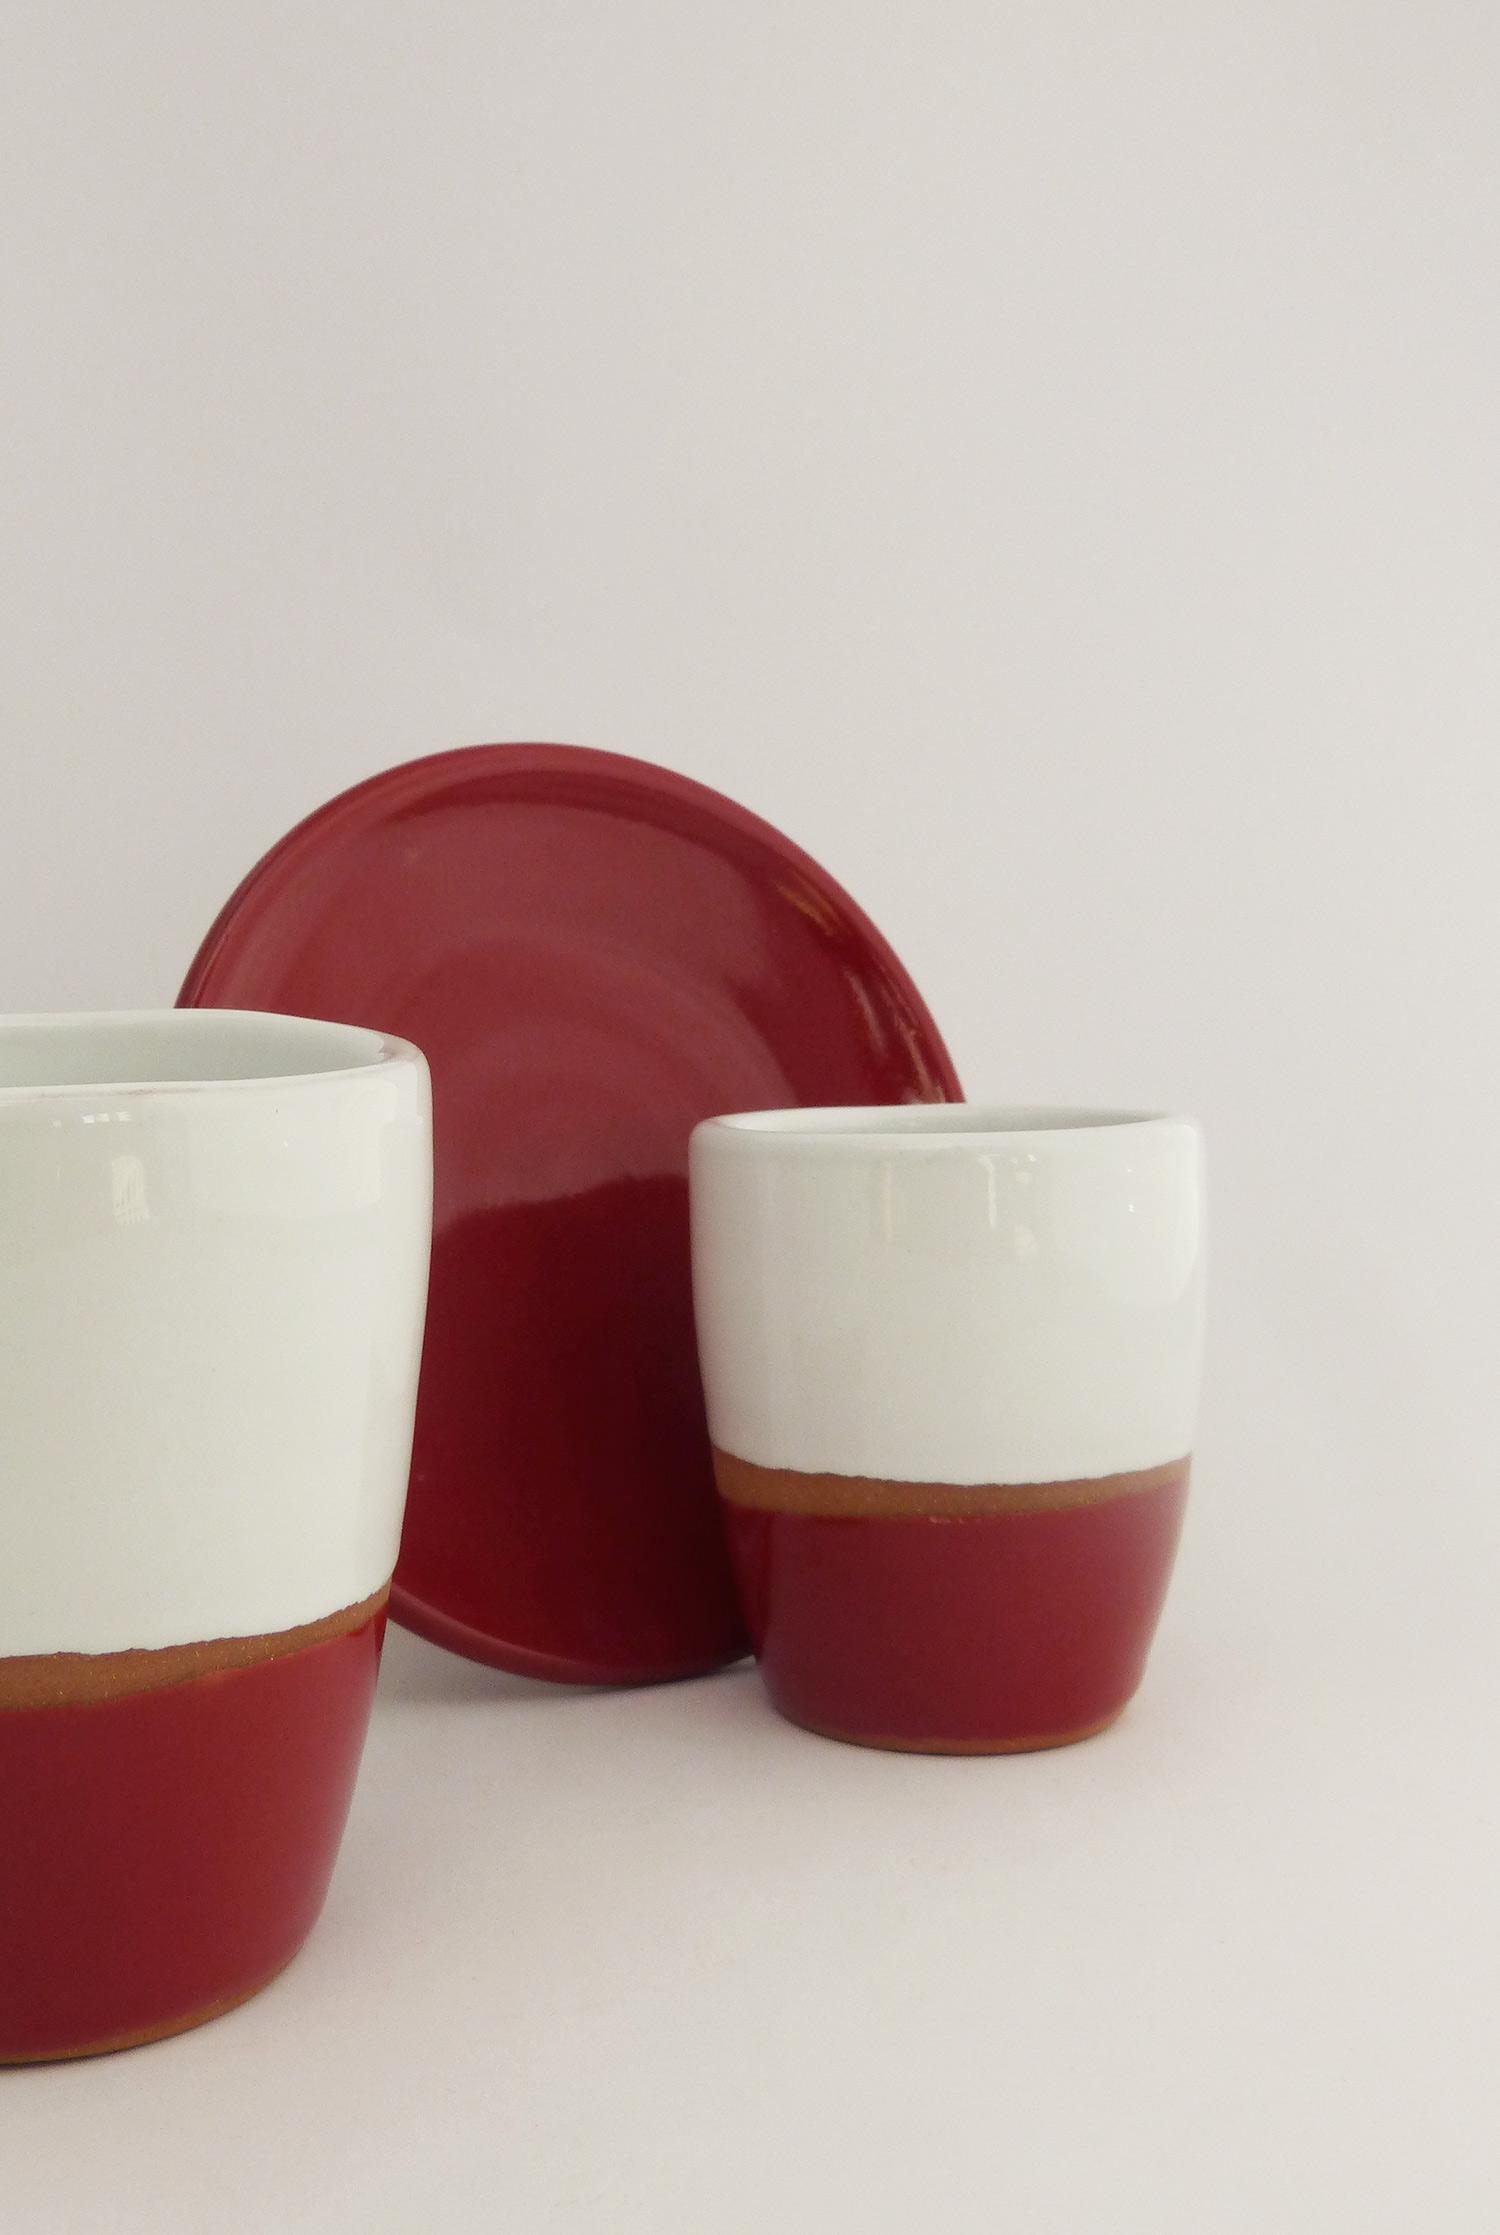 Tasse espresso terracotta couleur rouge - Atsonios Sifnos